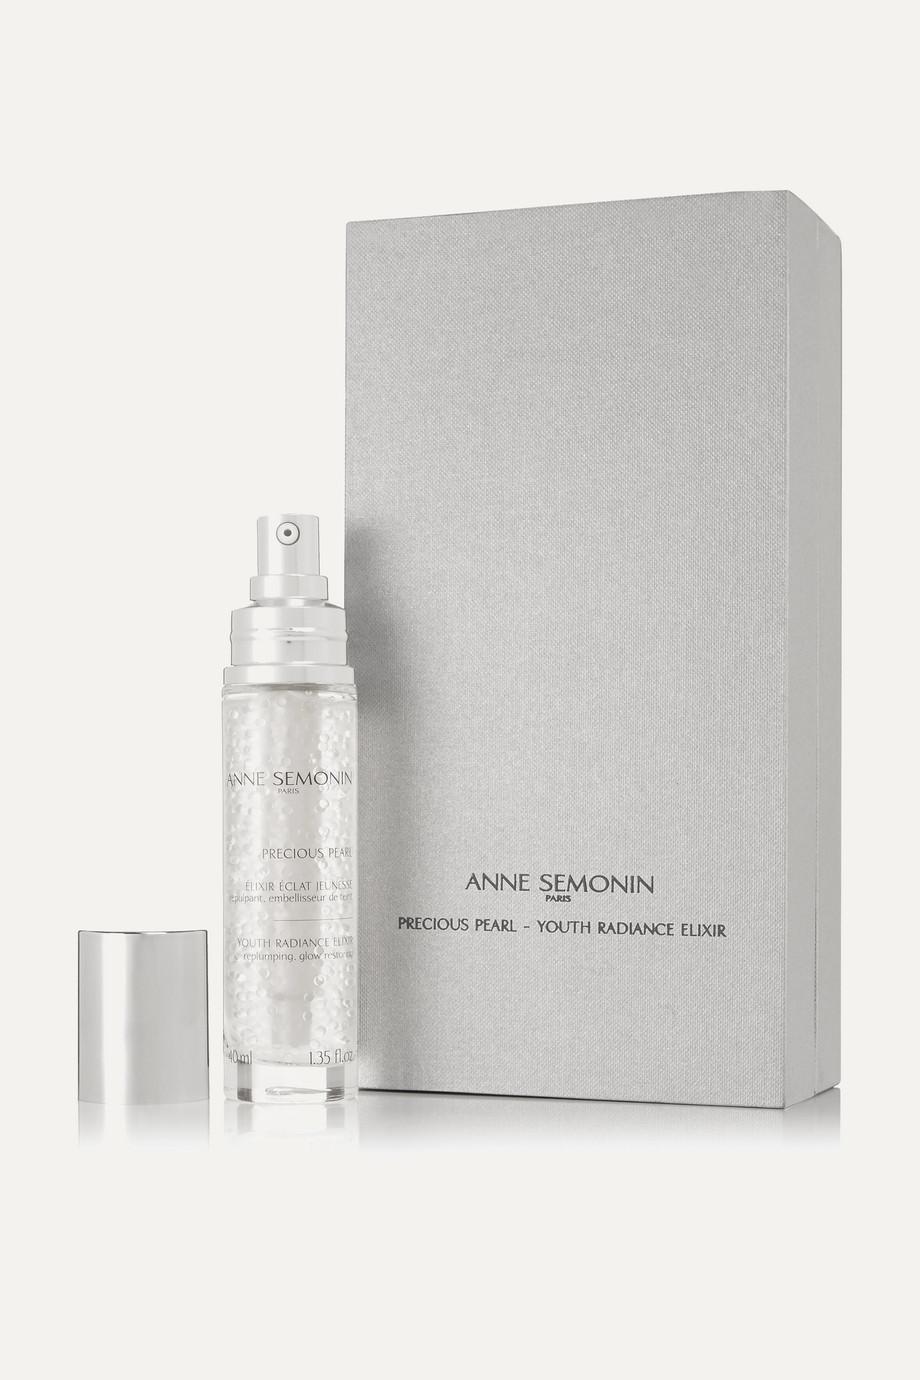 Anne Semonin Precious Pearl Youth Radiance Elixir, 40ml